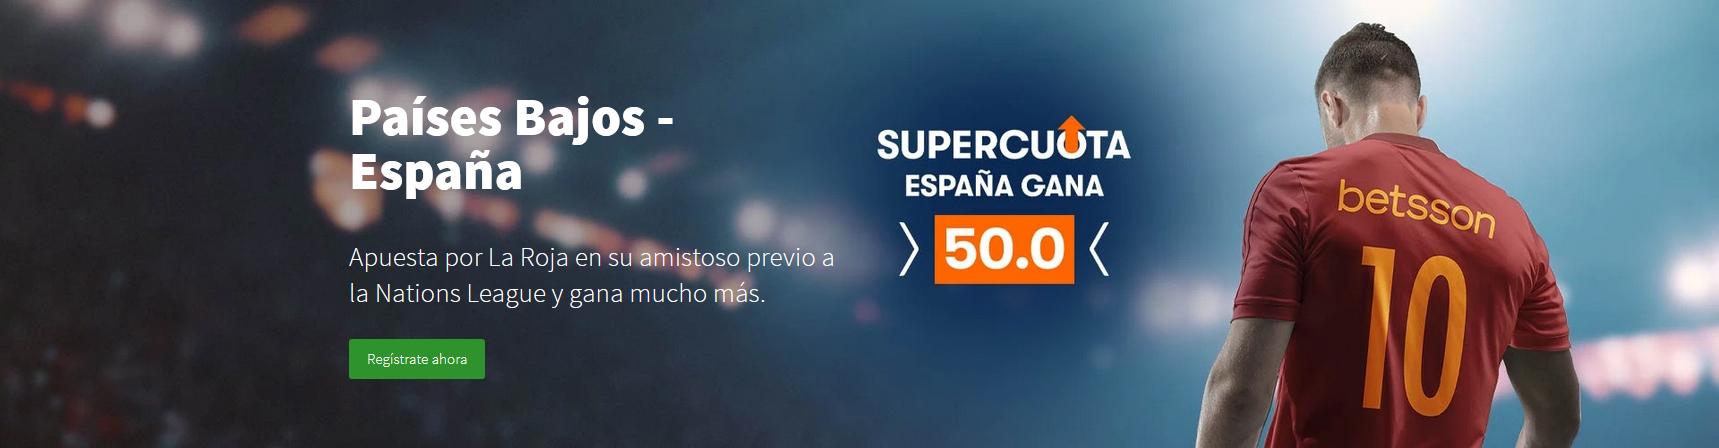 Supercuota España gana Holanda